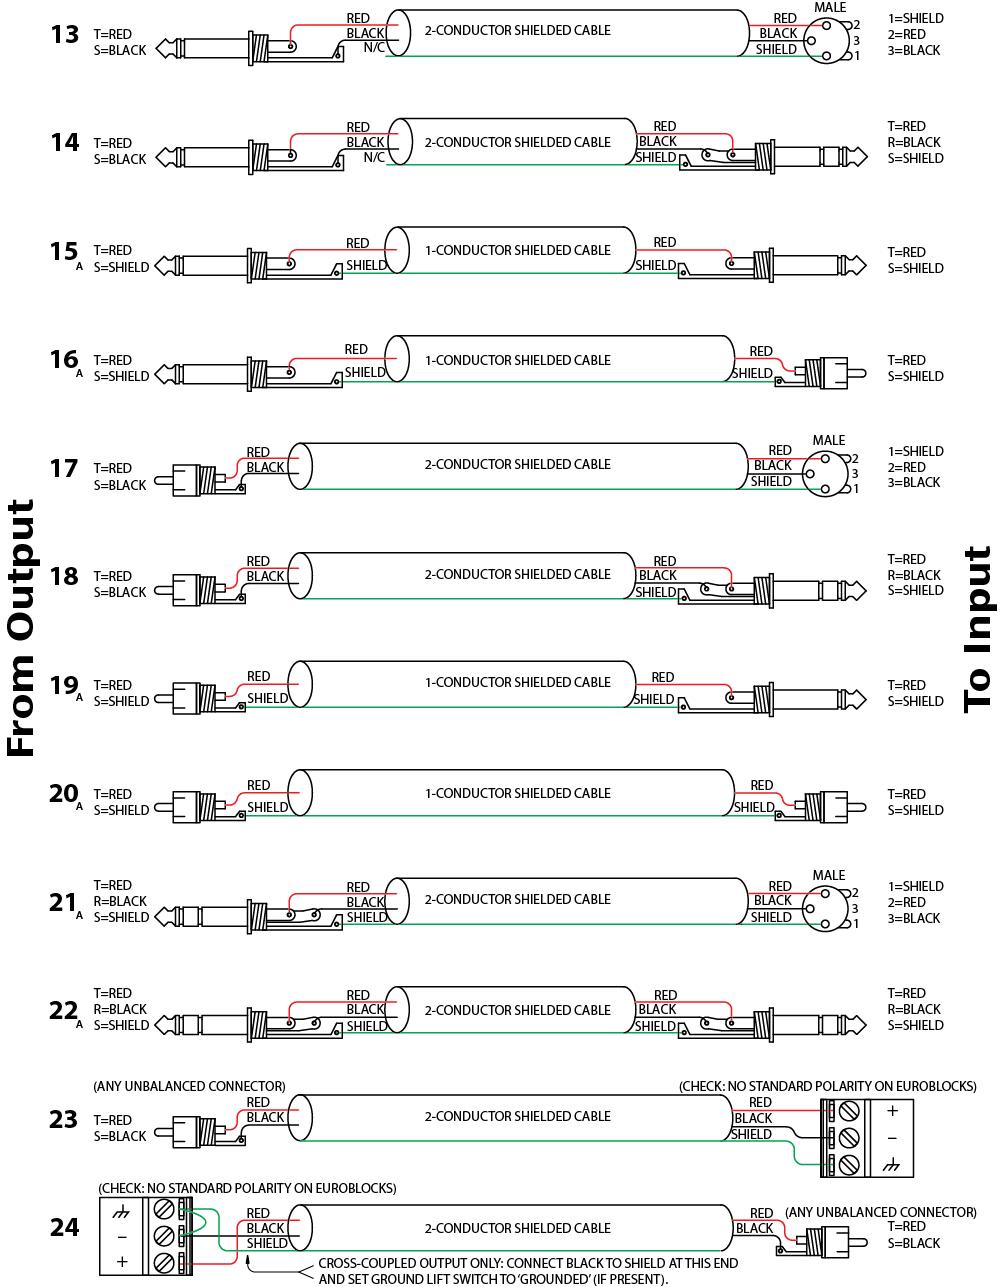 Xlr Wire Diagram | Wiring Diagram - Xlr Wiring Diagram